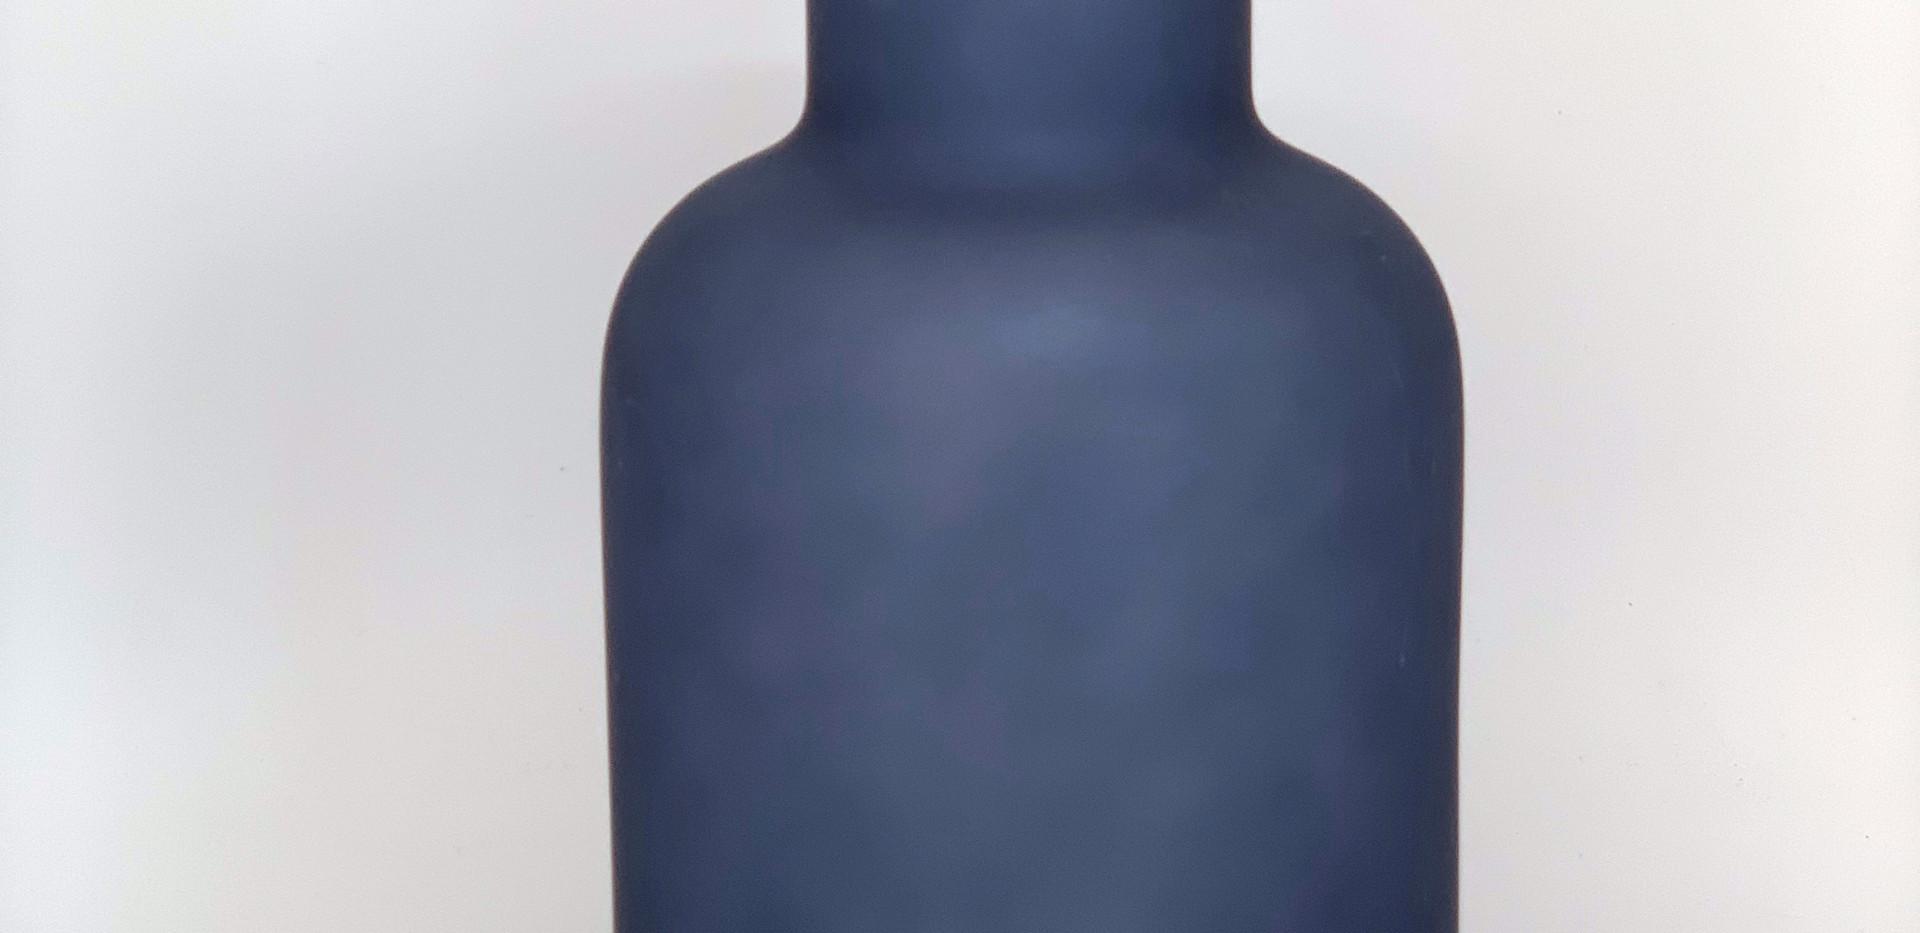 The Madame Vase